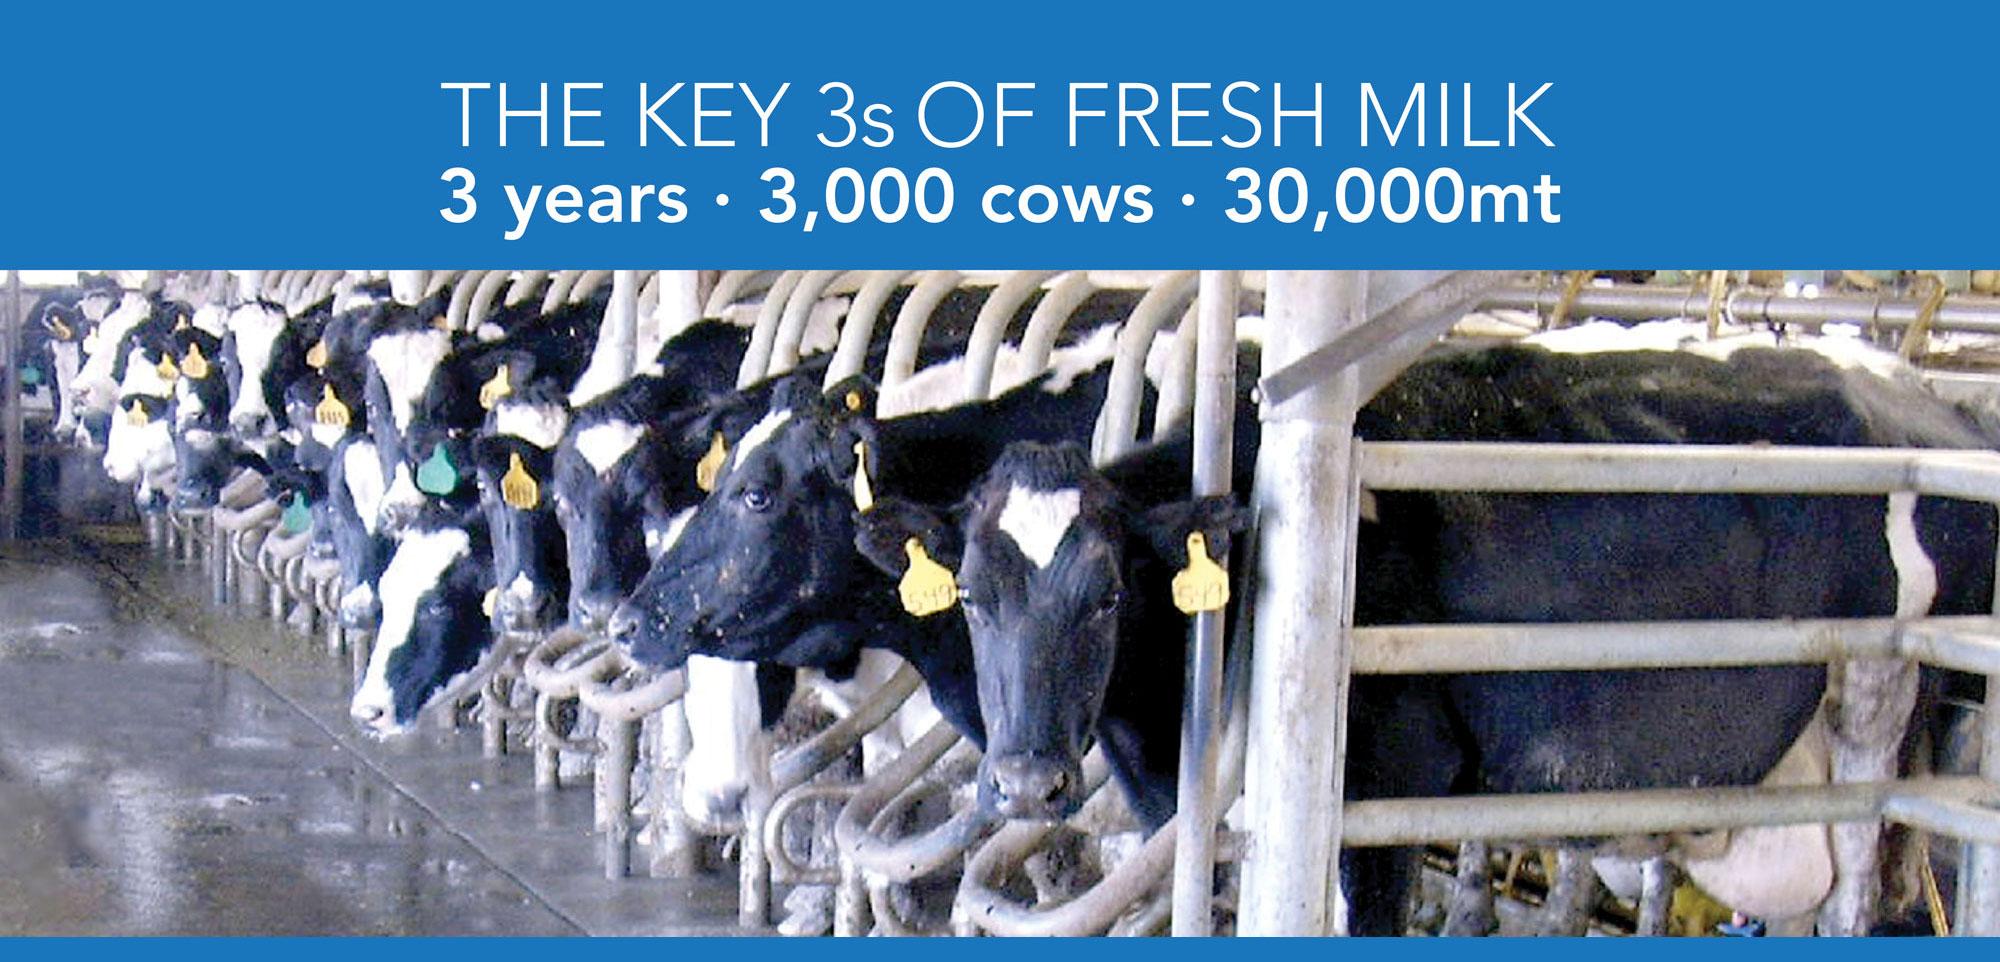 Key 3s of Milk Production image